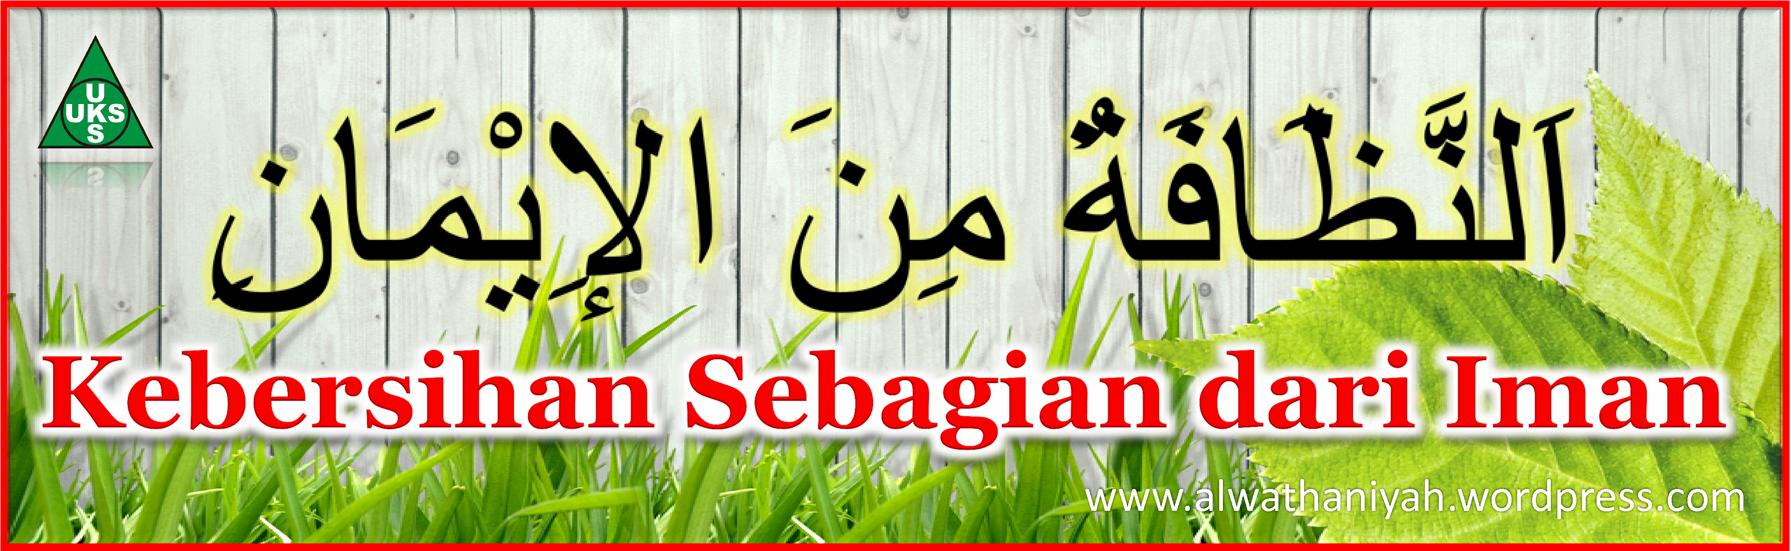 Slogan UKS Tulisan Banner Kata Mutiara MI ISLAMIYAH ALWATHANIYAH